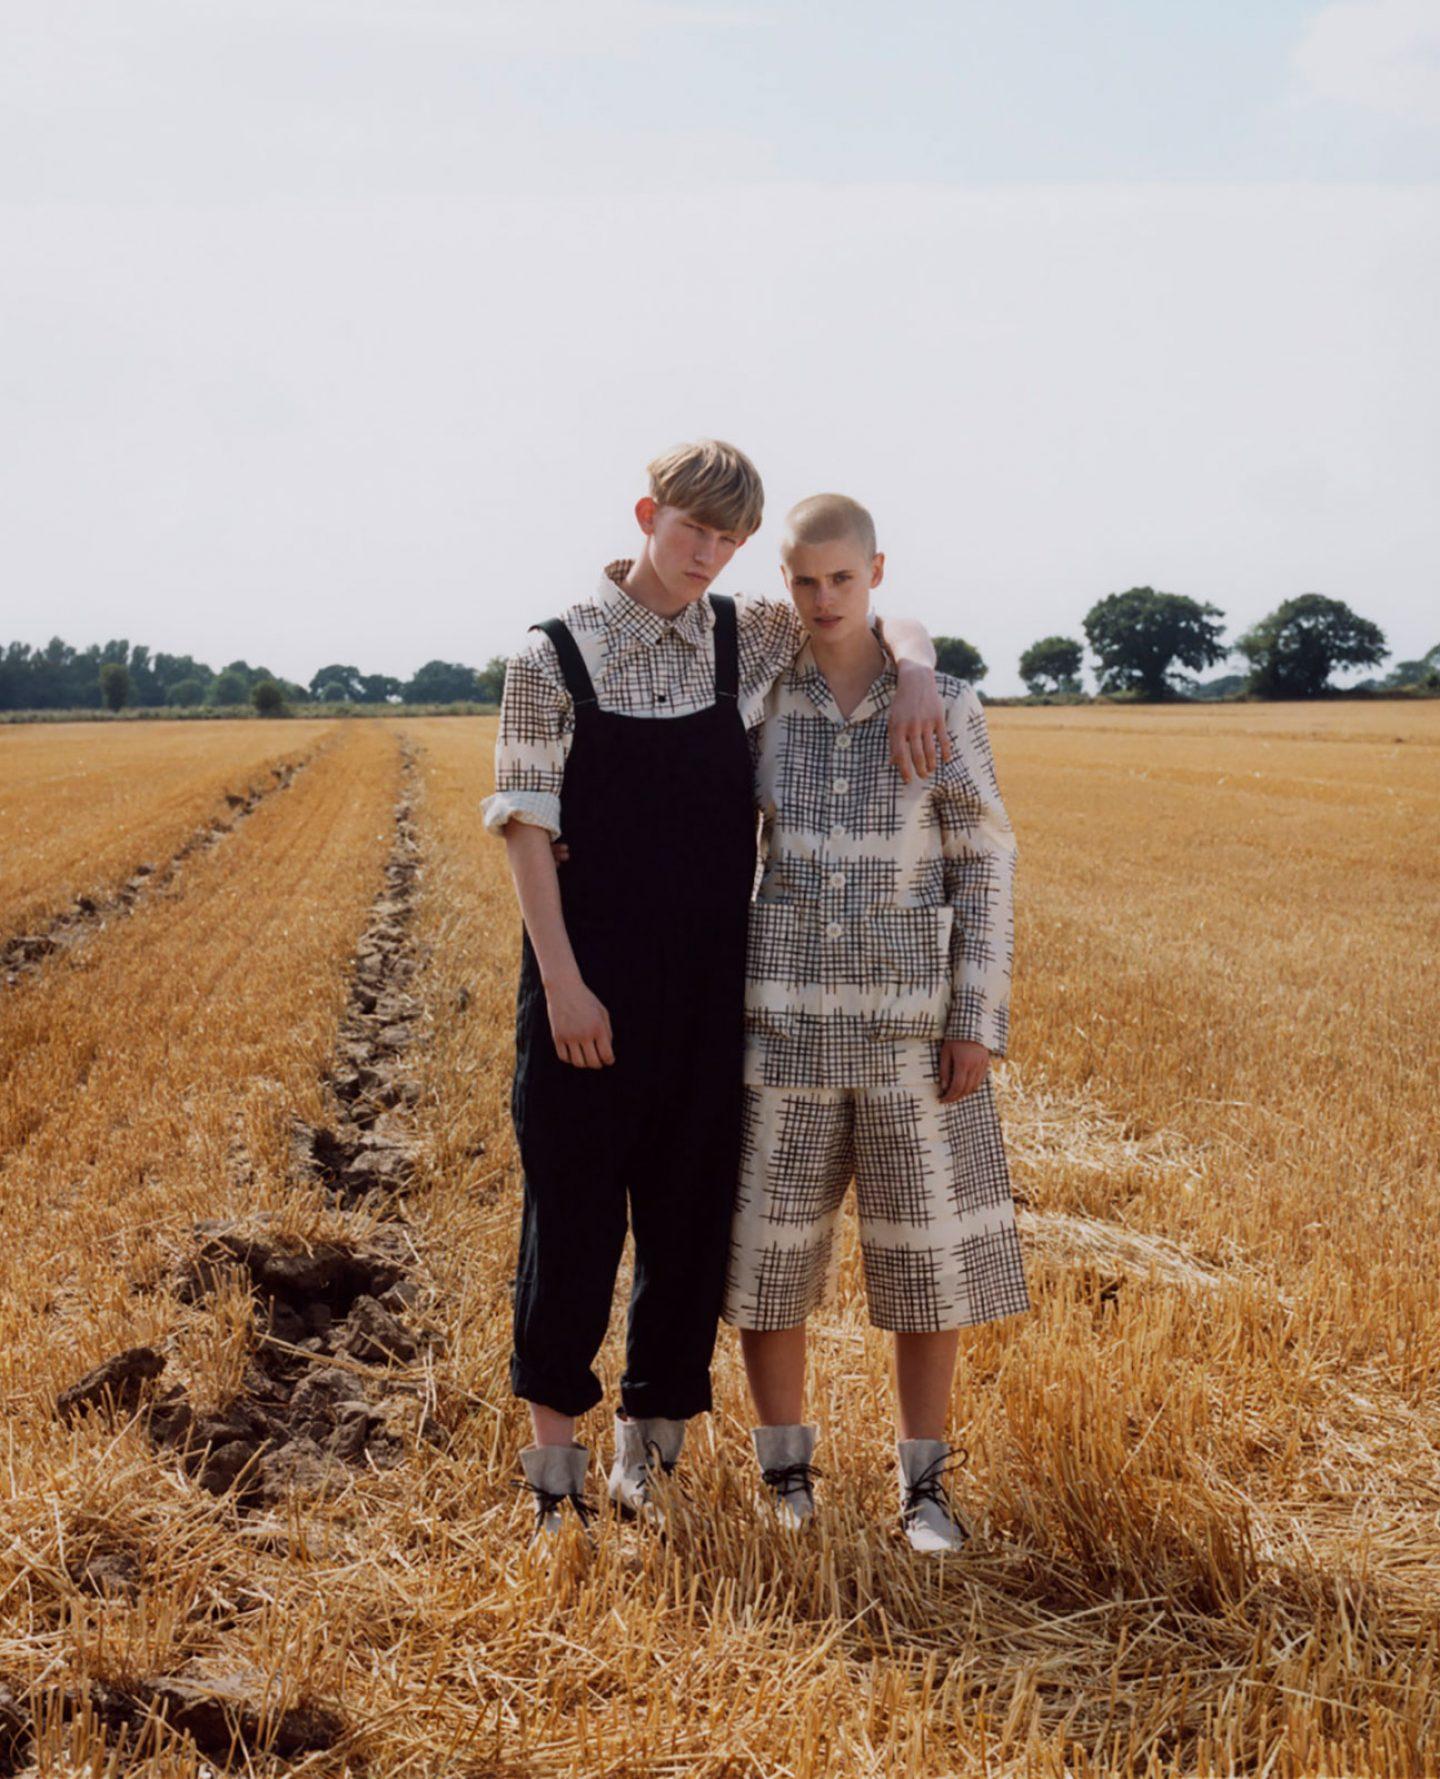 ignant-fashion-toogood-006-collection-13